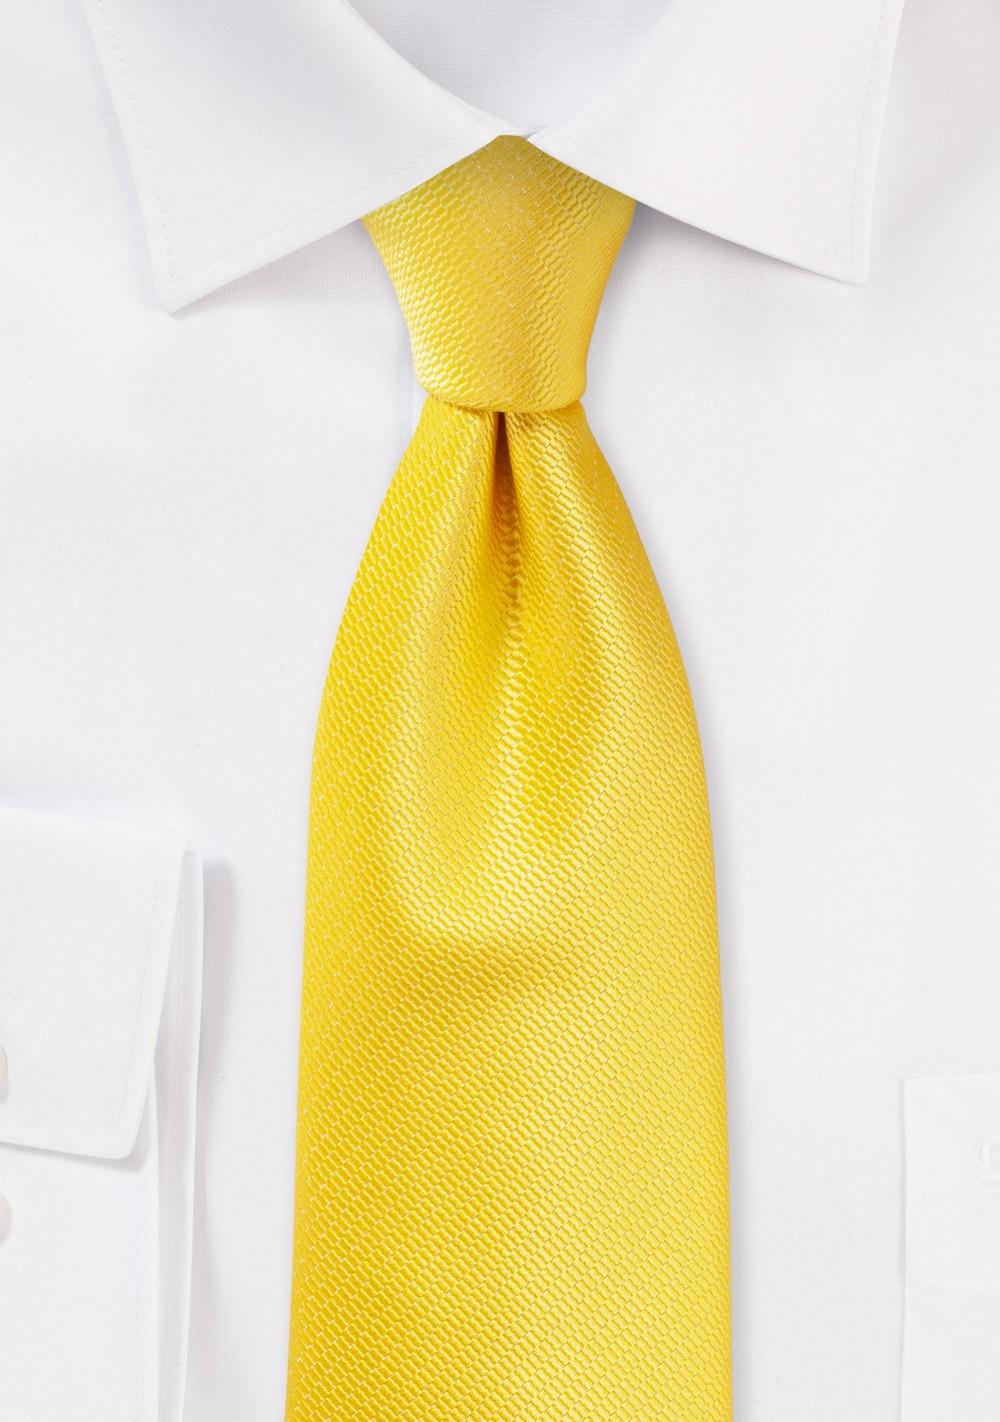 Bright Summer Tie in Daffodil